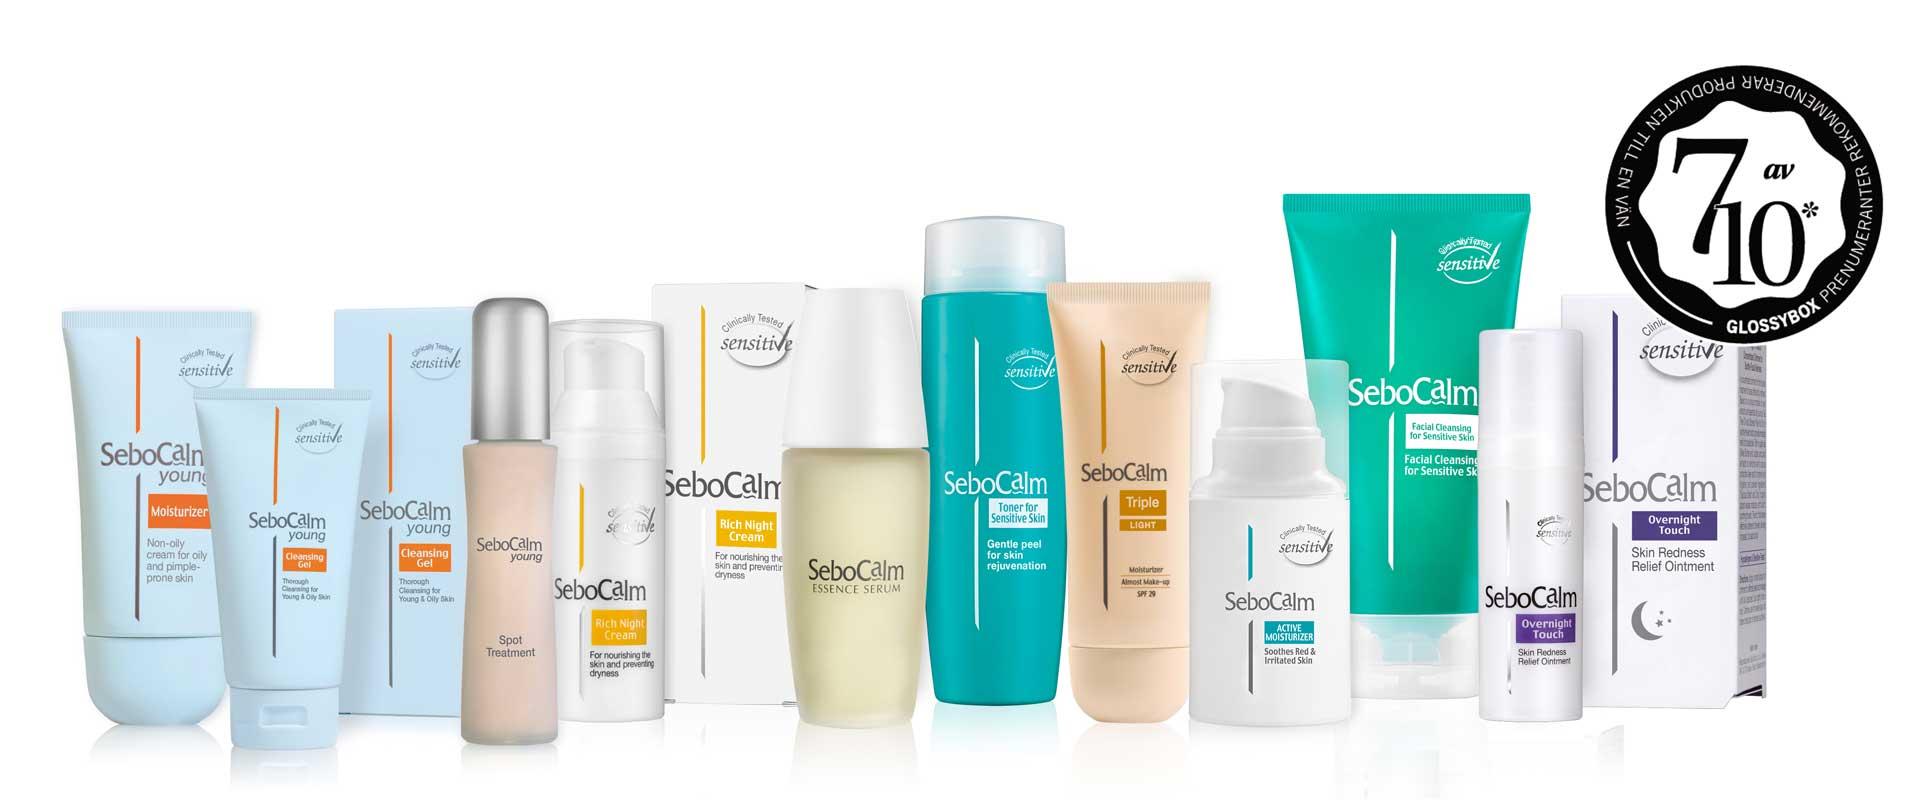 SeboCalm Sensitive skincare